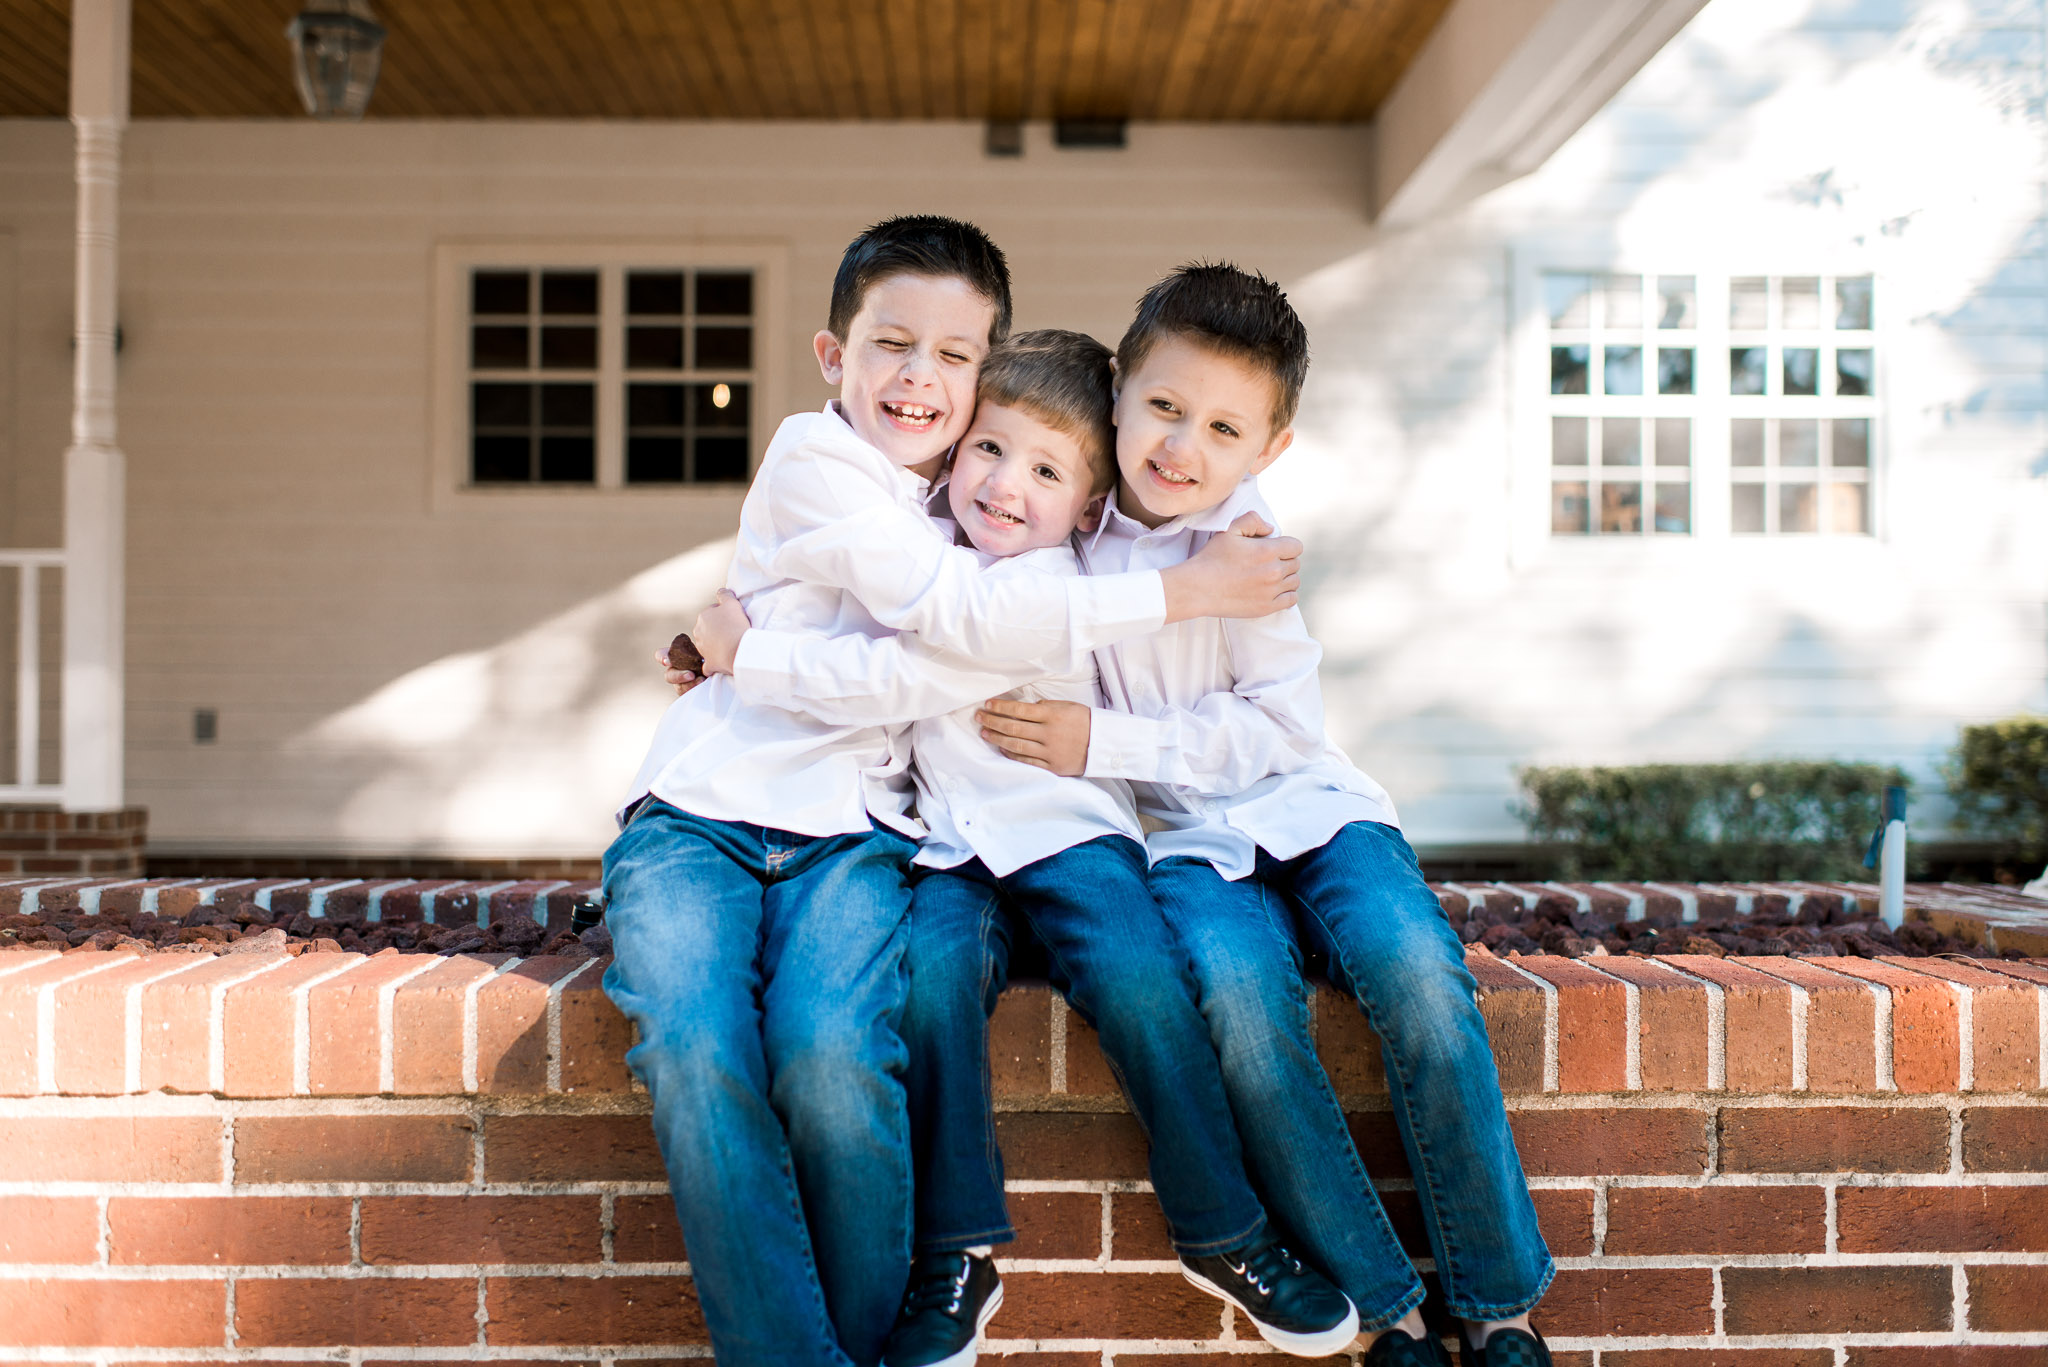 KateTaramykinStudios-Orlando-Family-Photographer-Keenan-5.jpg